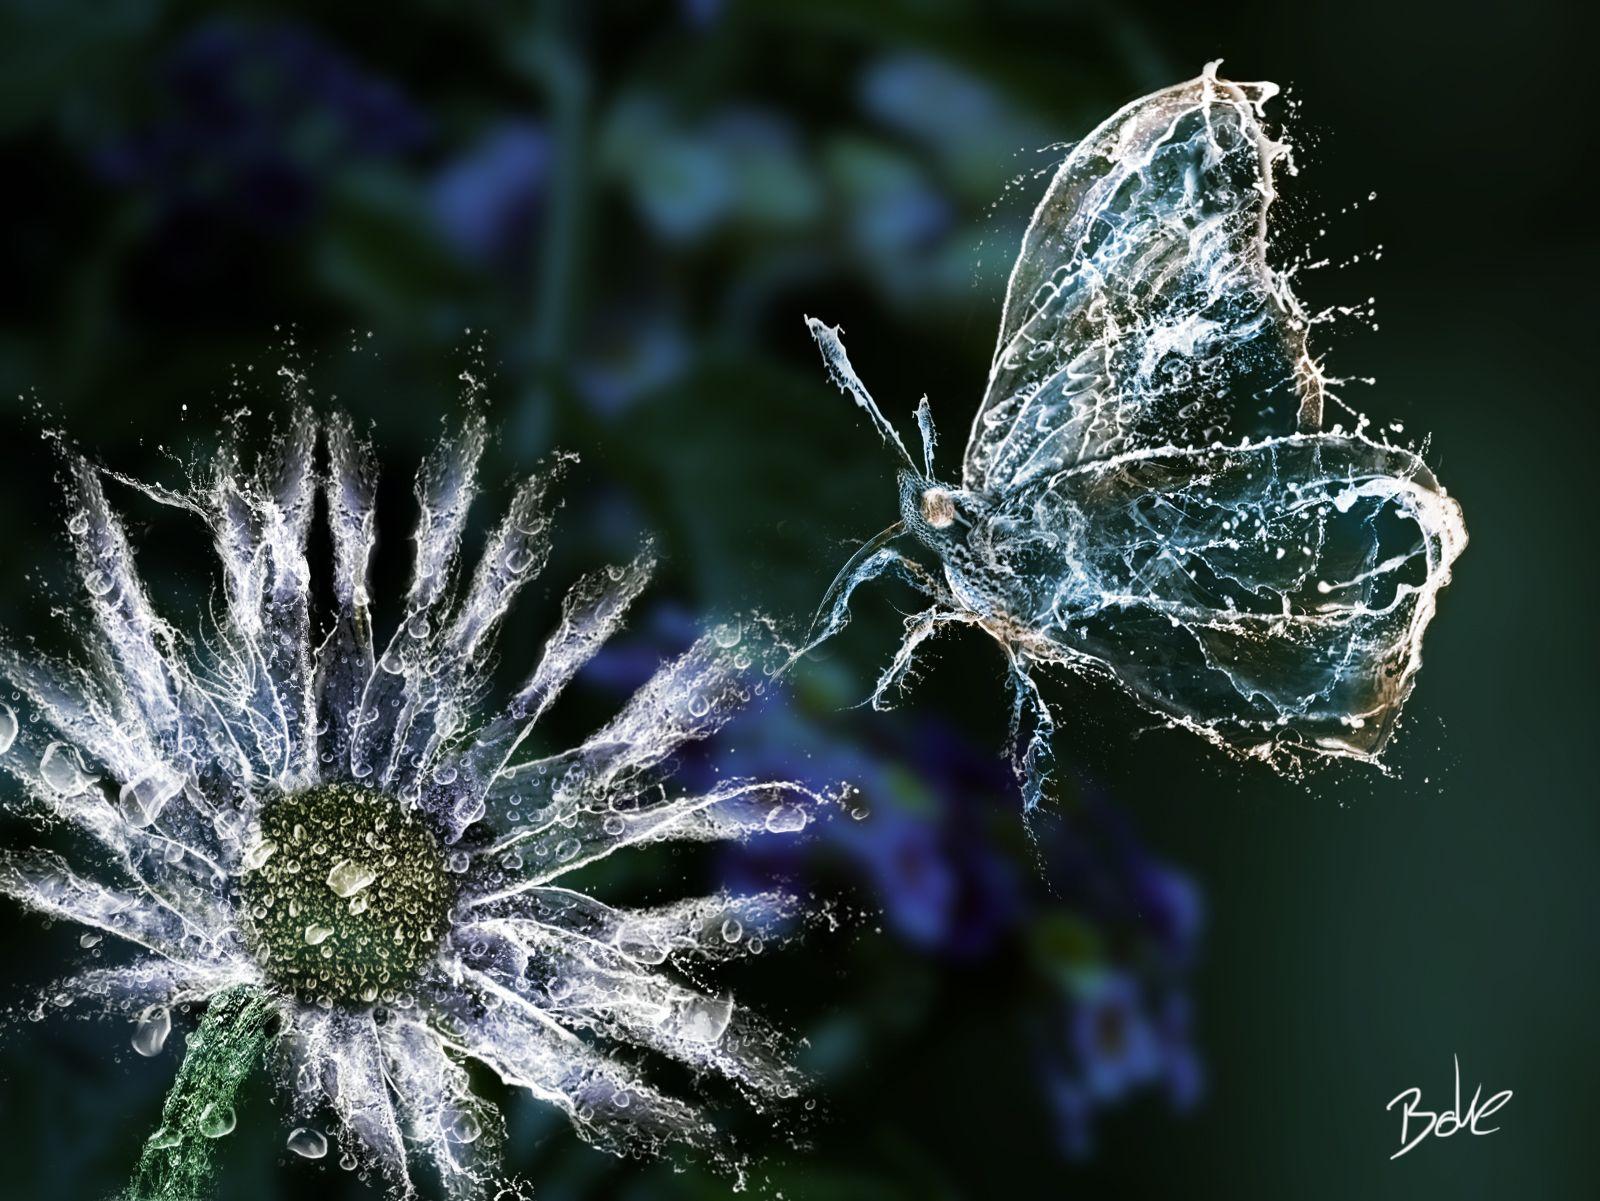 1000 Natural Wonders: Sascha Bokelmann Feature - Photo Manipulation